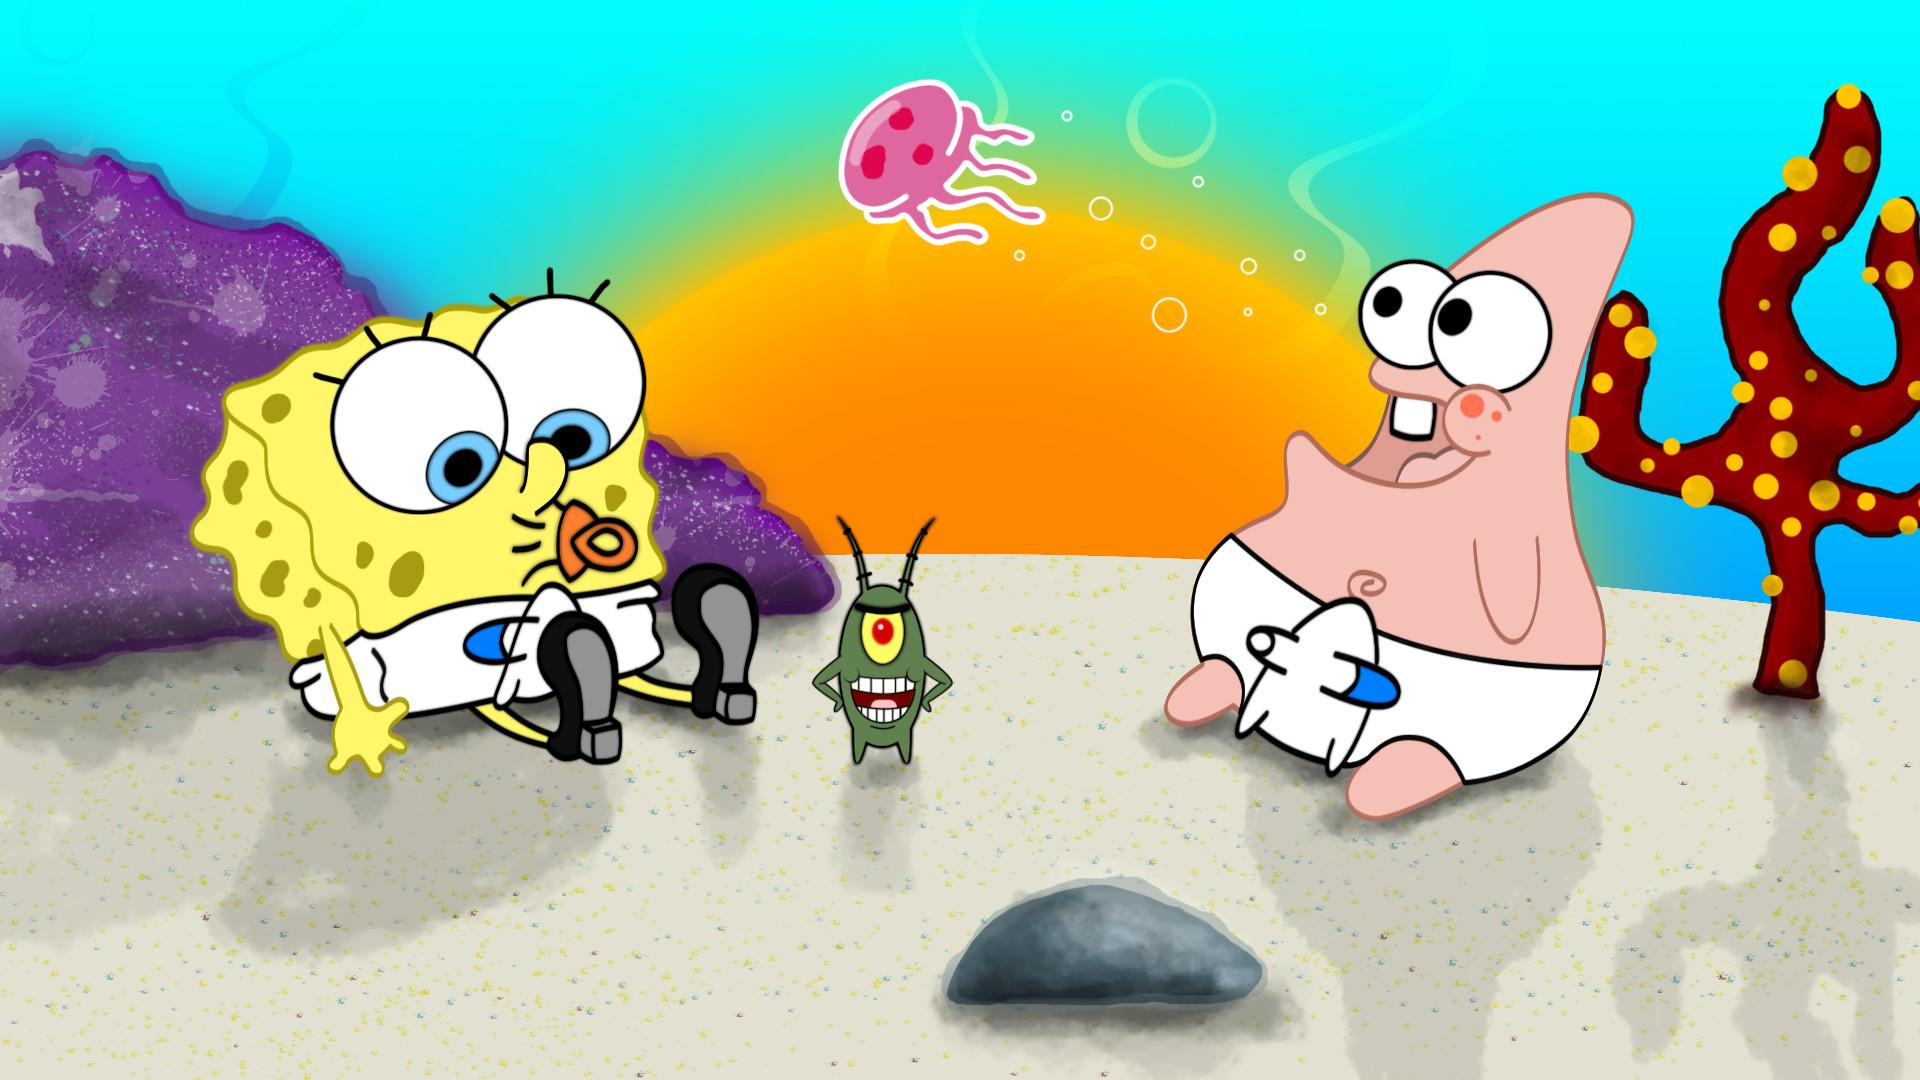 Galaxy S5 Fall Wallpaper Spongebob Squarepants Wallpaper 66 Images